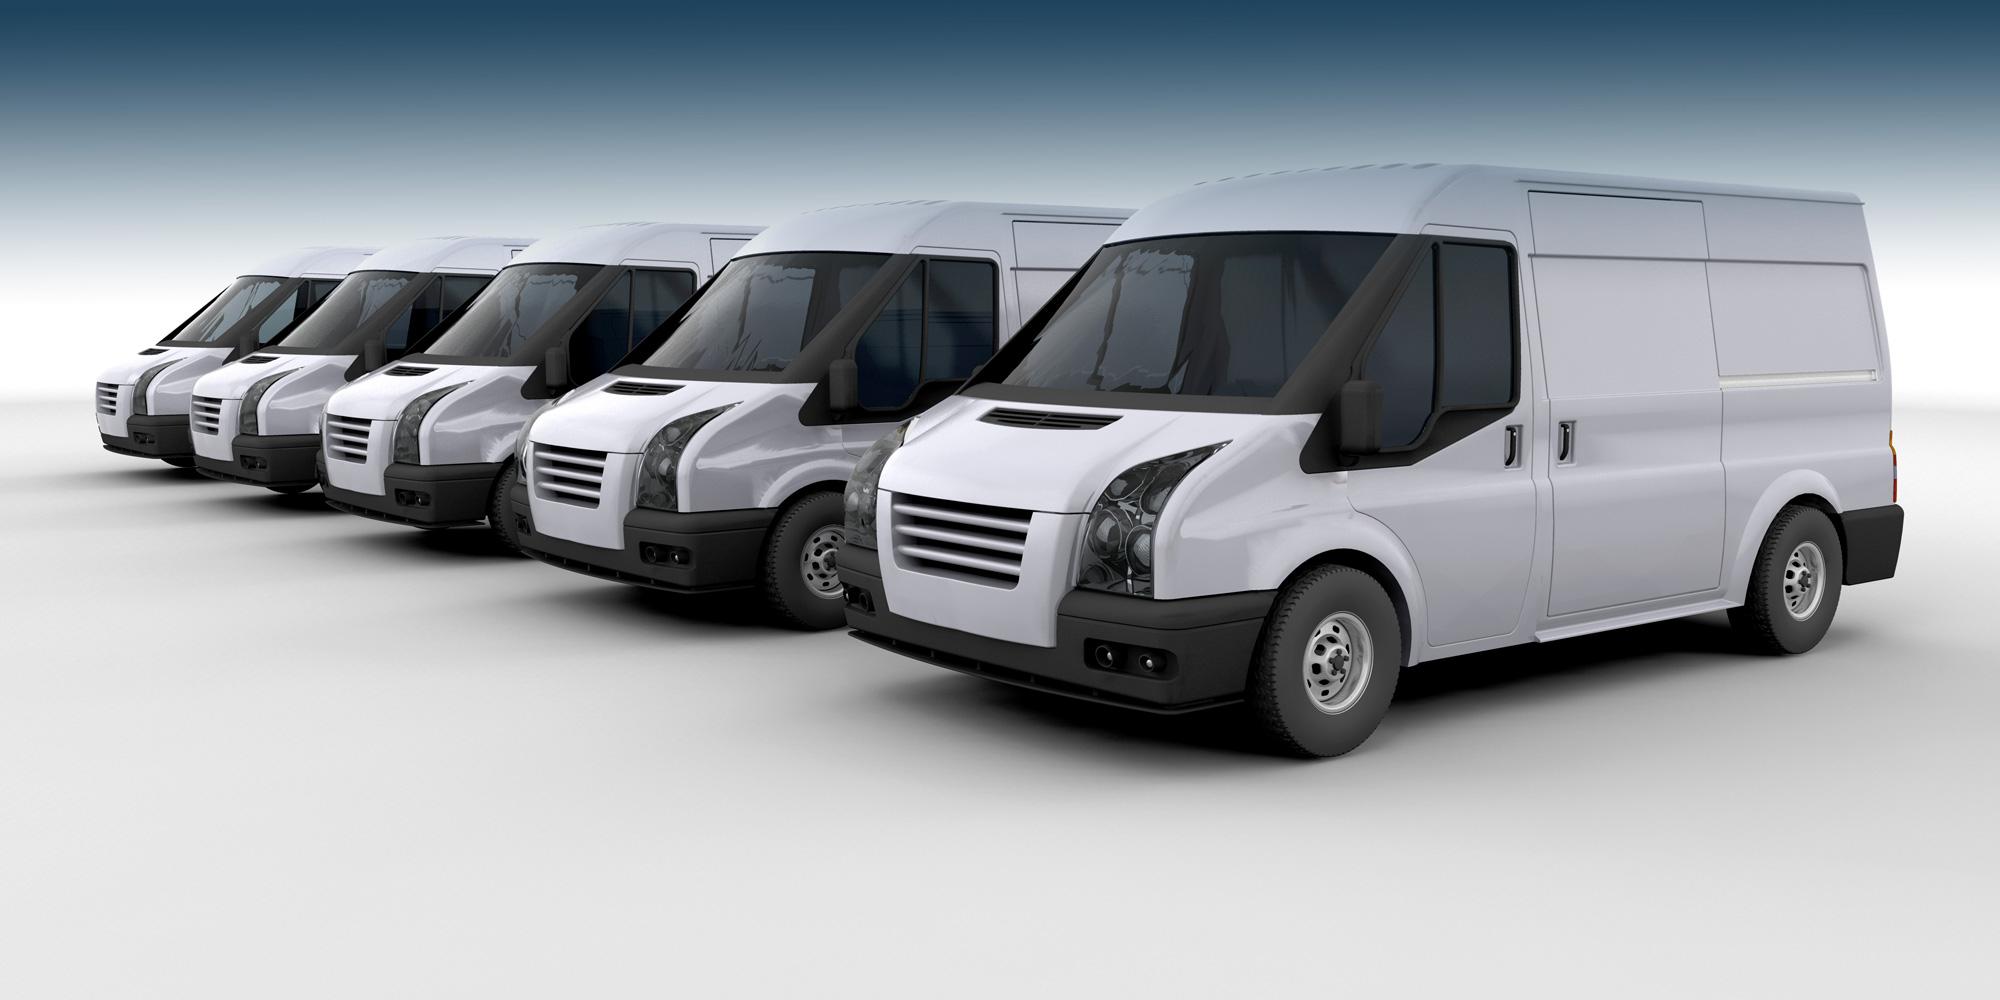 Fleet_Transport1 Fleet Management Tools